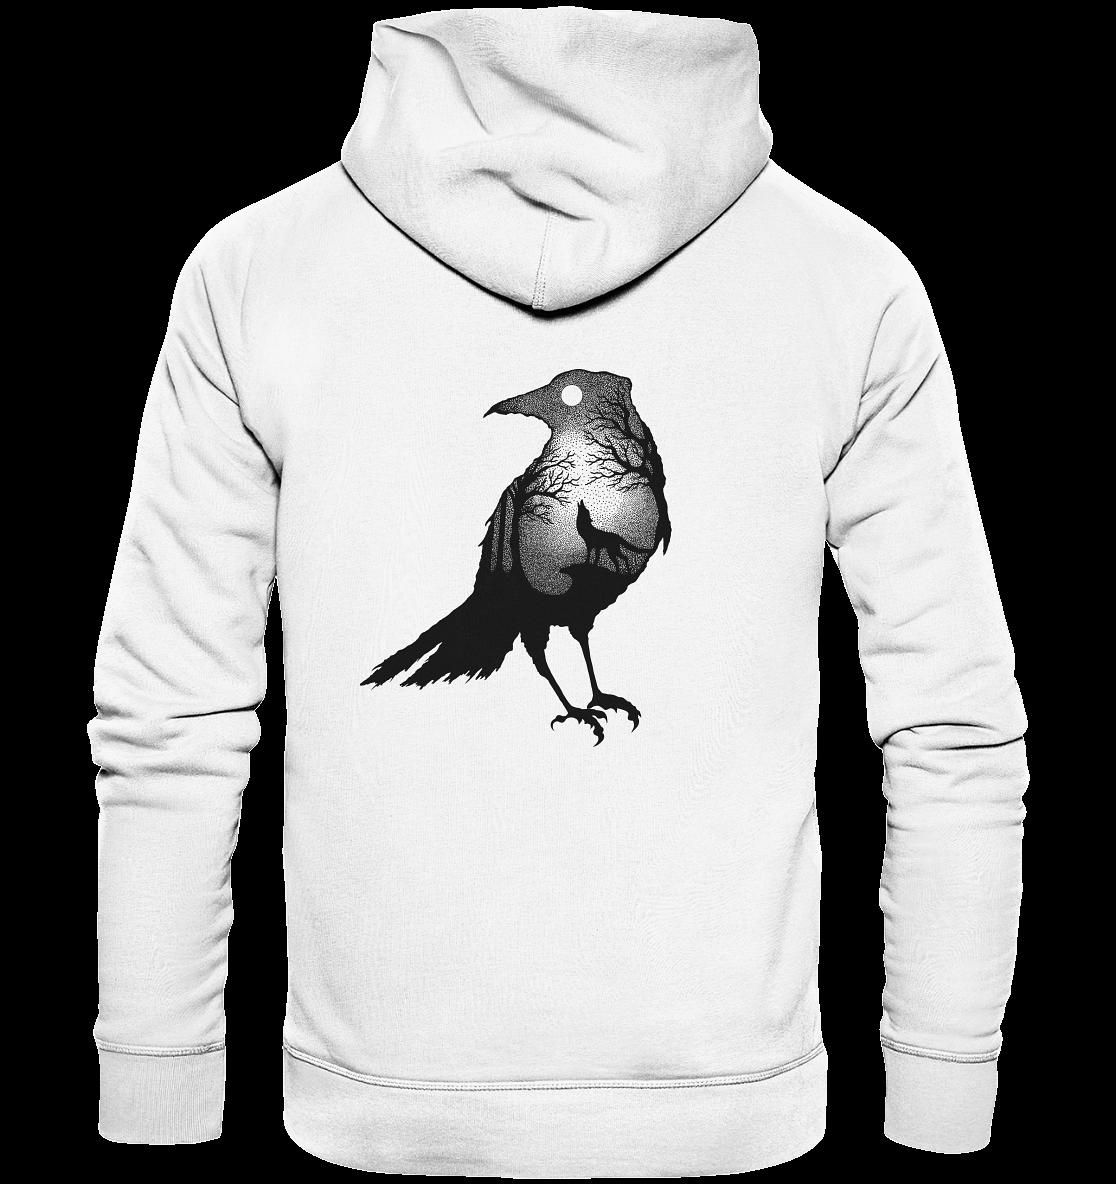 back-organic-fashion-hoodie-f8f8f8-1116x-2.png